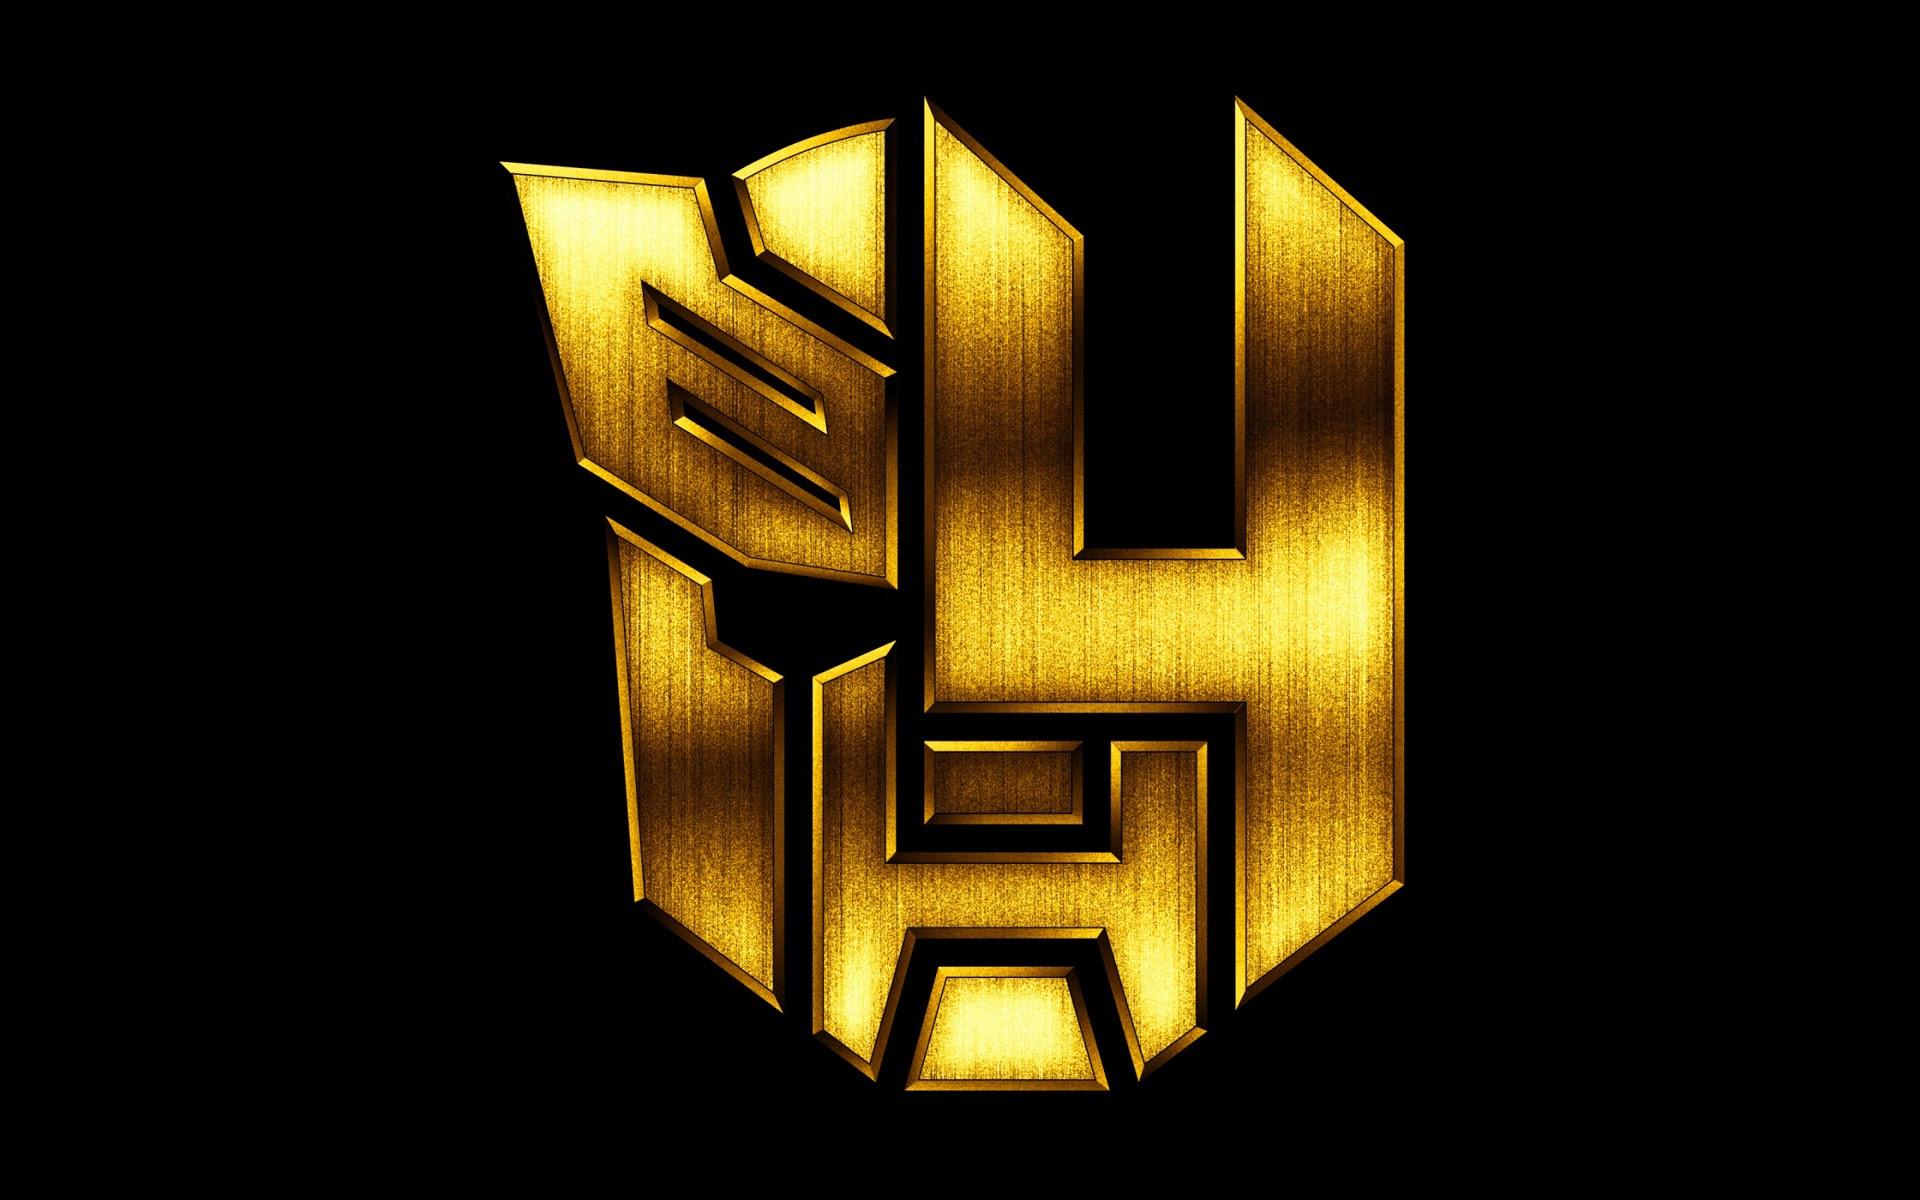 transformer 4 logo autobot age of extinction 2014 movie hd wallpaper 1920x1200